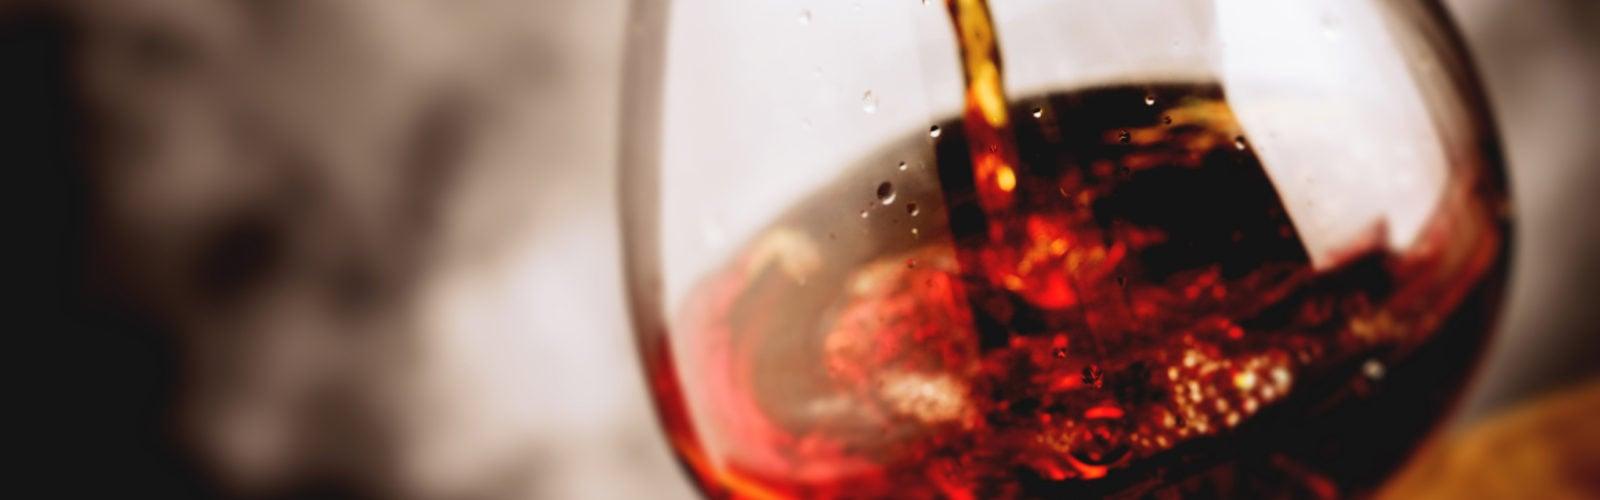 whisky-glass